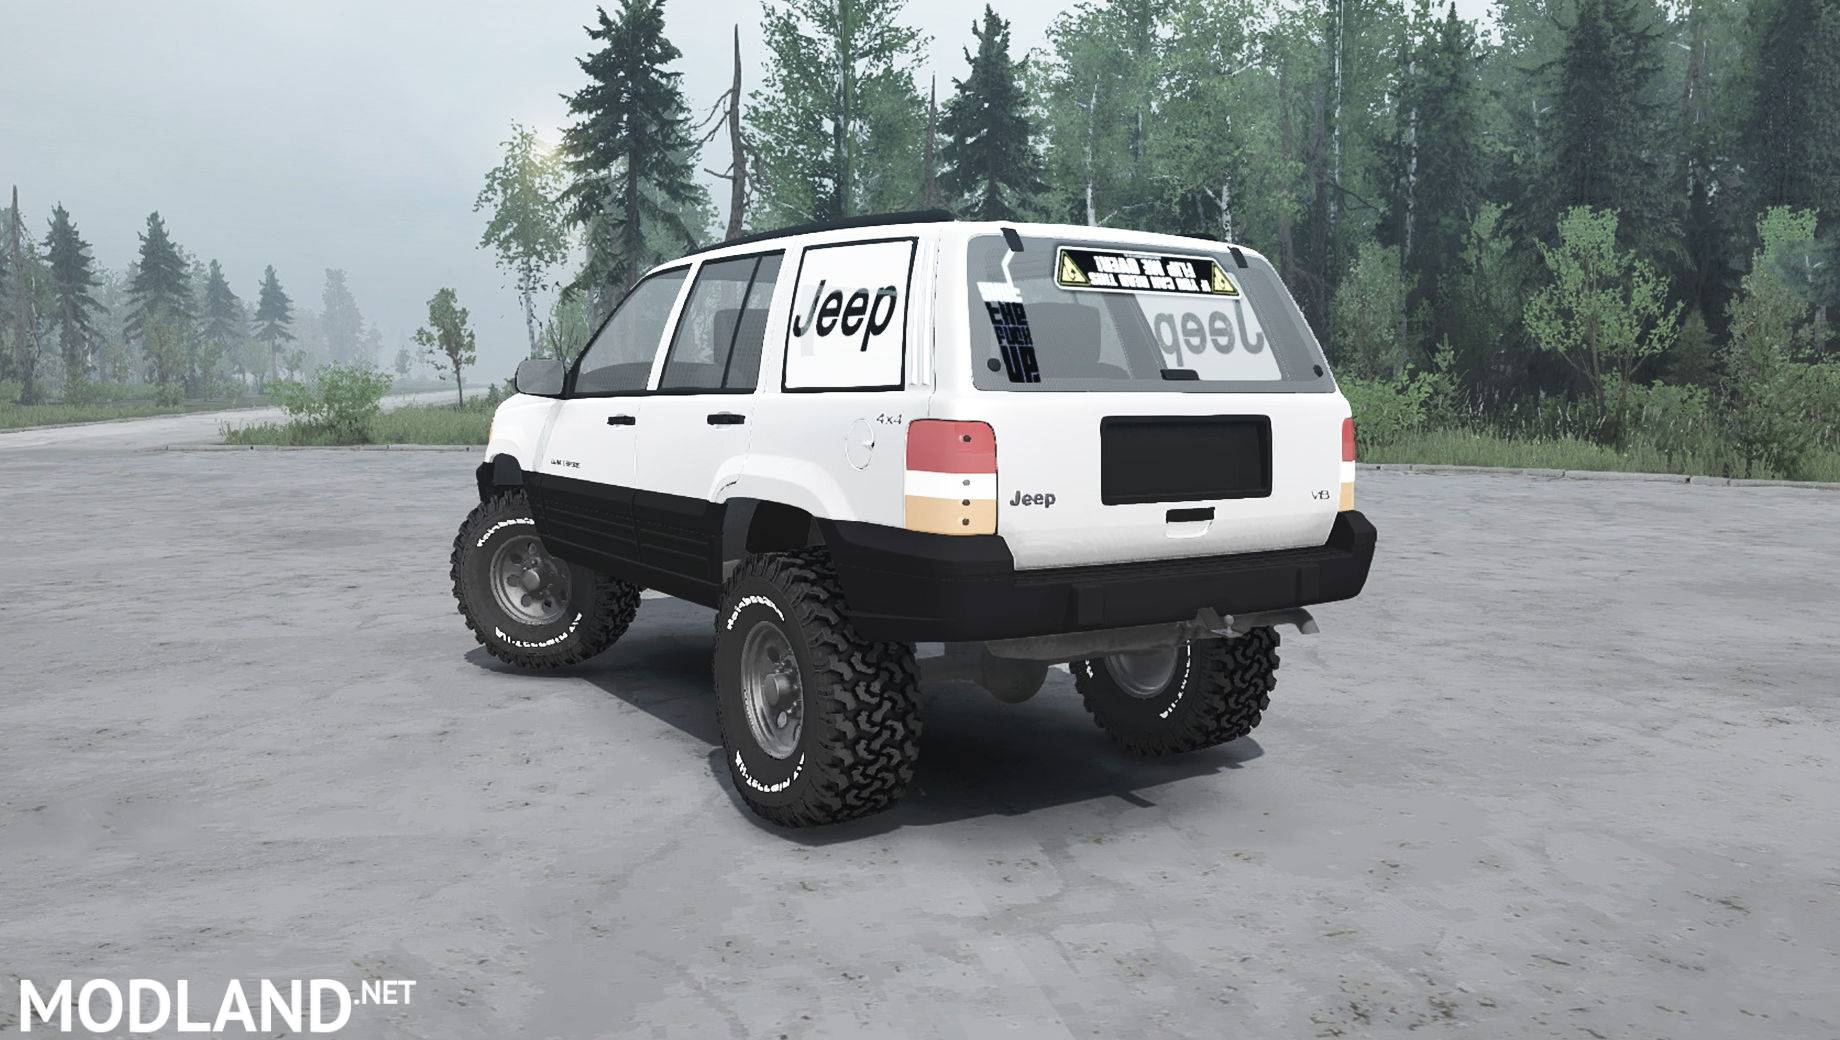 Jeep Grand Cherokee Tires >> Jeep Grand Cherokee (ZJ) - Spintires: MudRunner